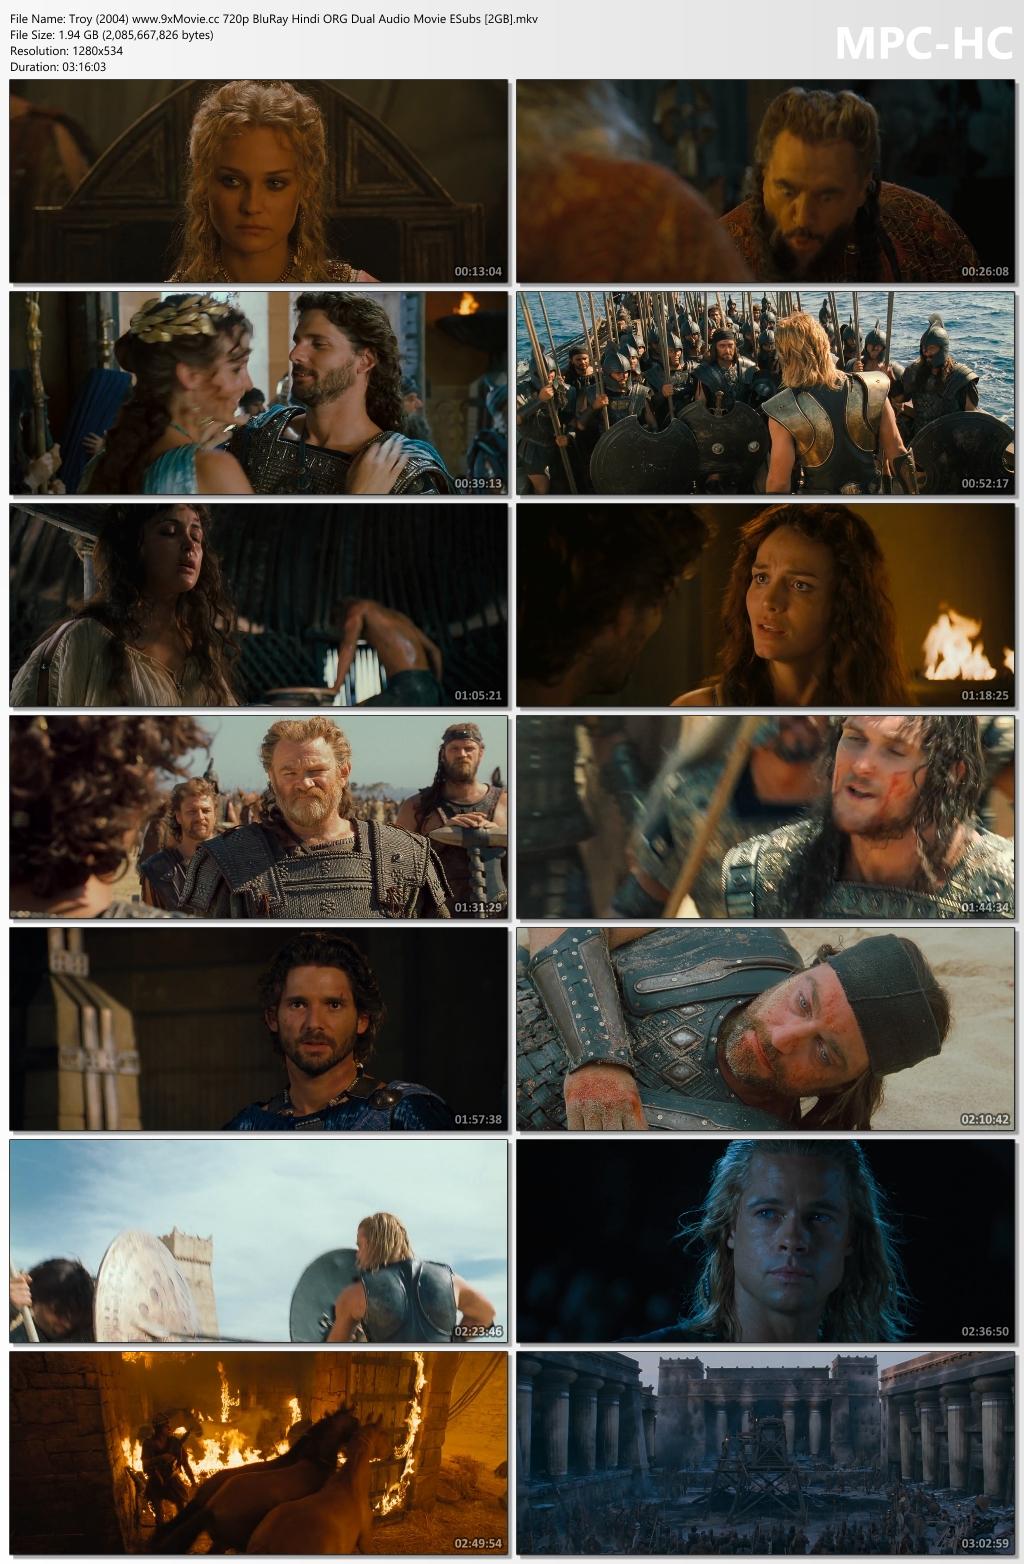 Troy-2004-www-9x-Movie-cc-720p-Blu-Ray-Hindi-ORG-Dual-Audio-Movie-ESubs-2-GB-mkv